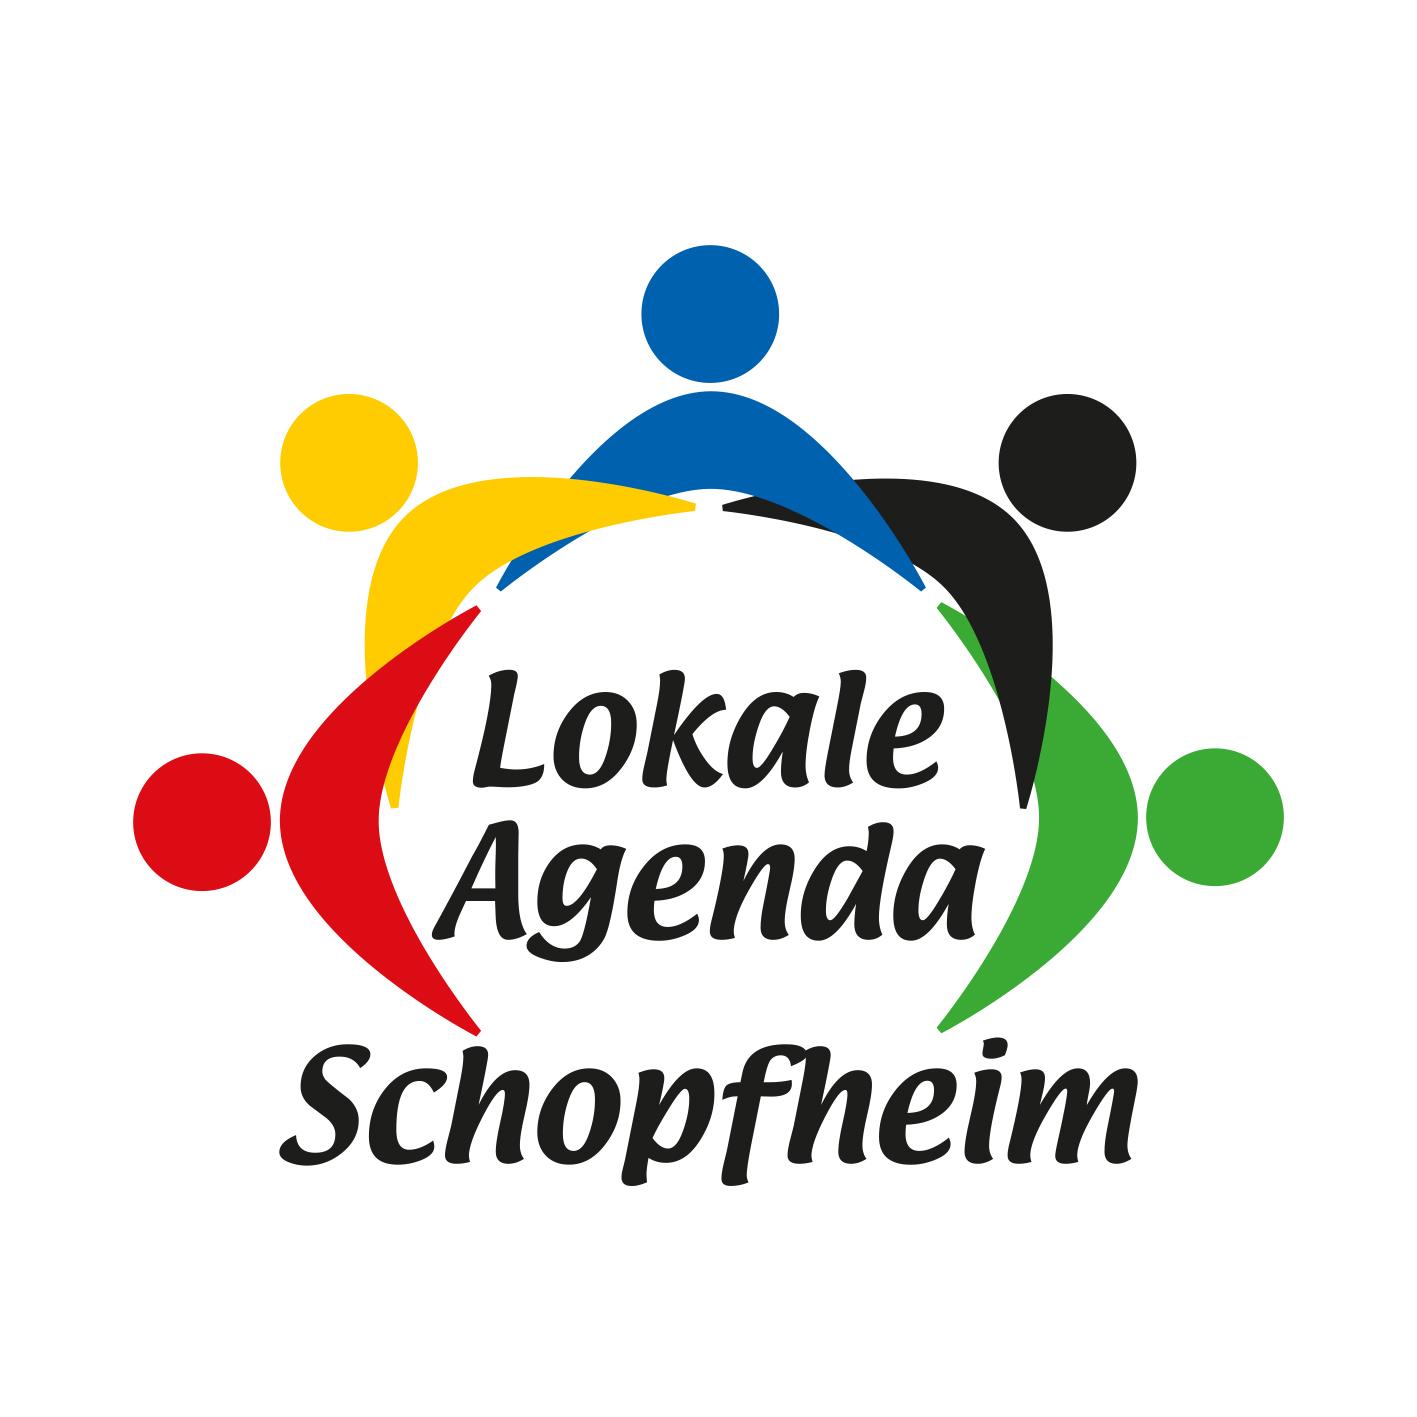 Lokale Agenda